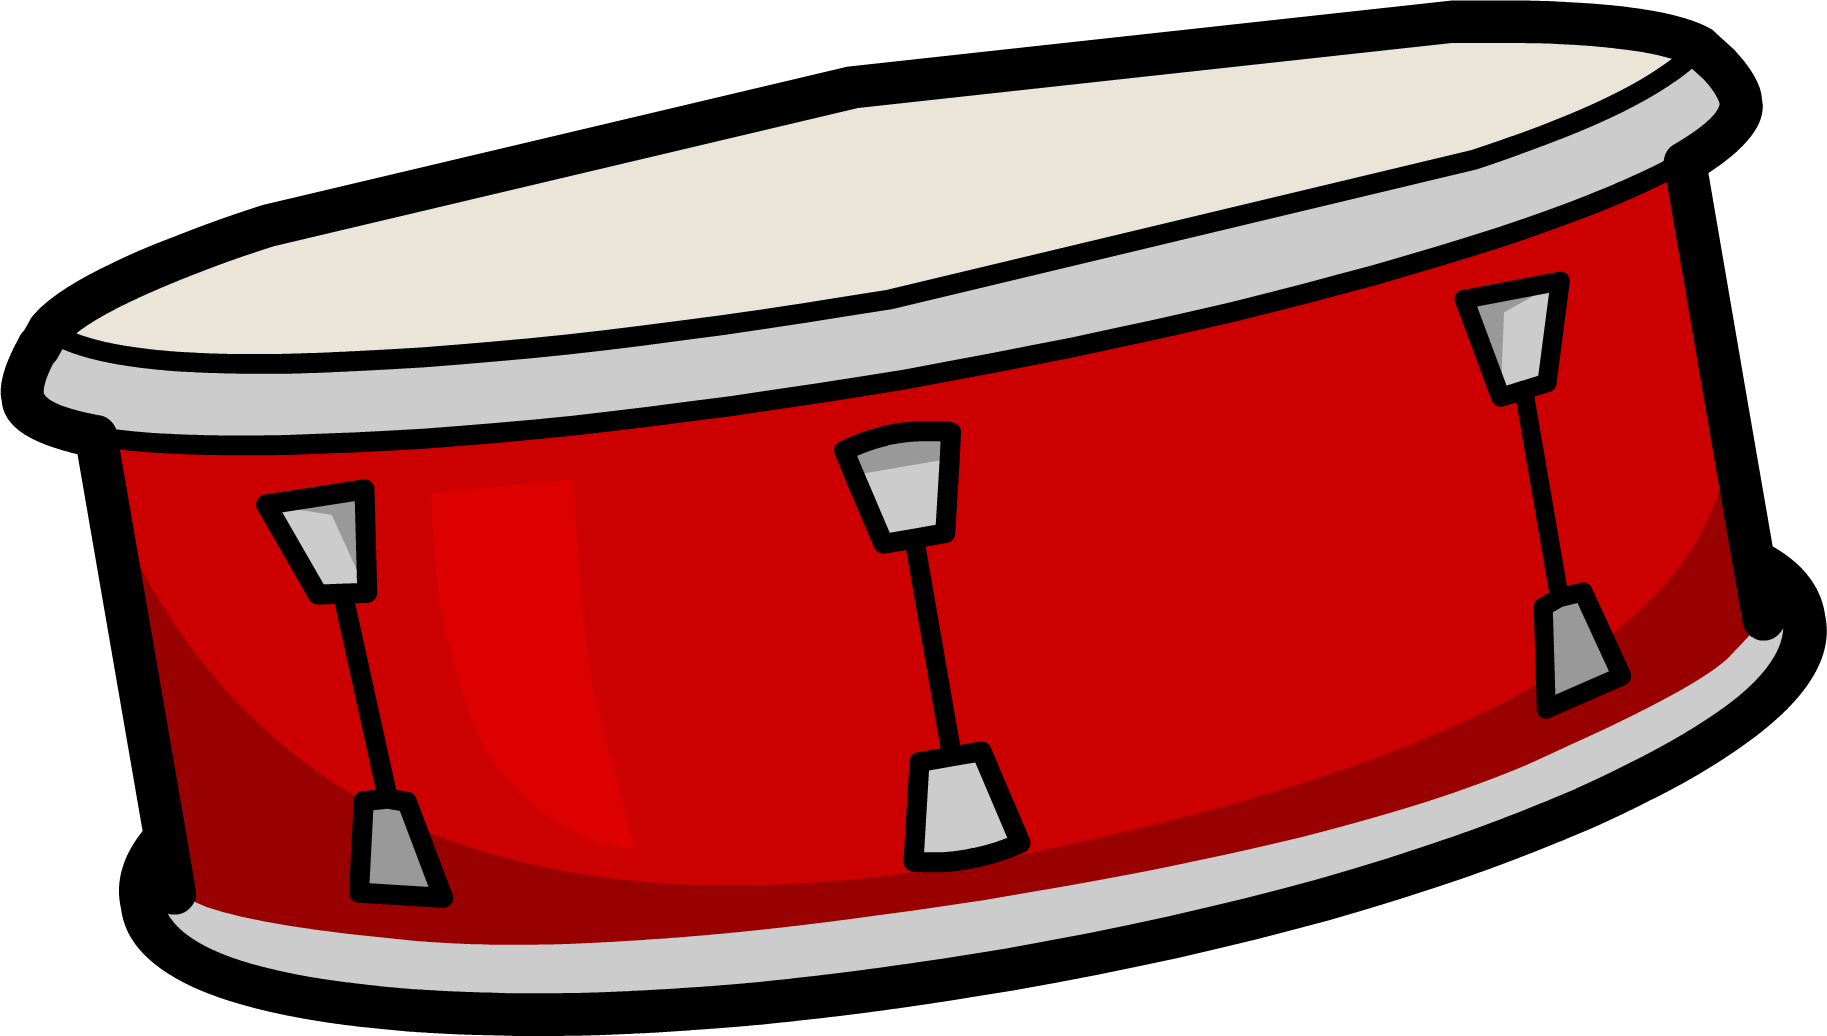 image snare drum png club penguin wiki fandom powered by wikia rh clubpenguin wikia com  snare drum clip art free